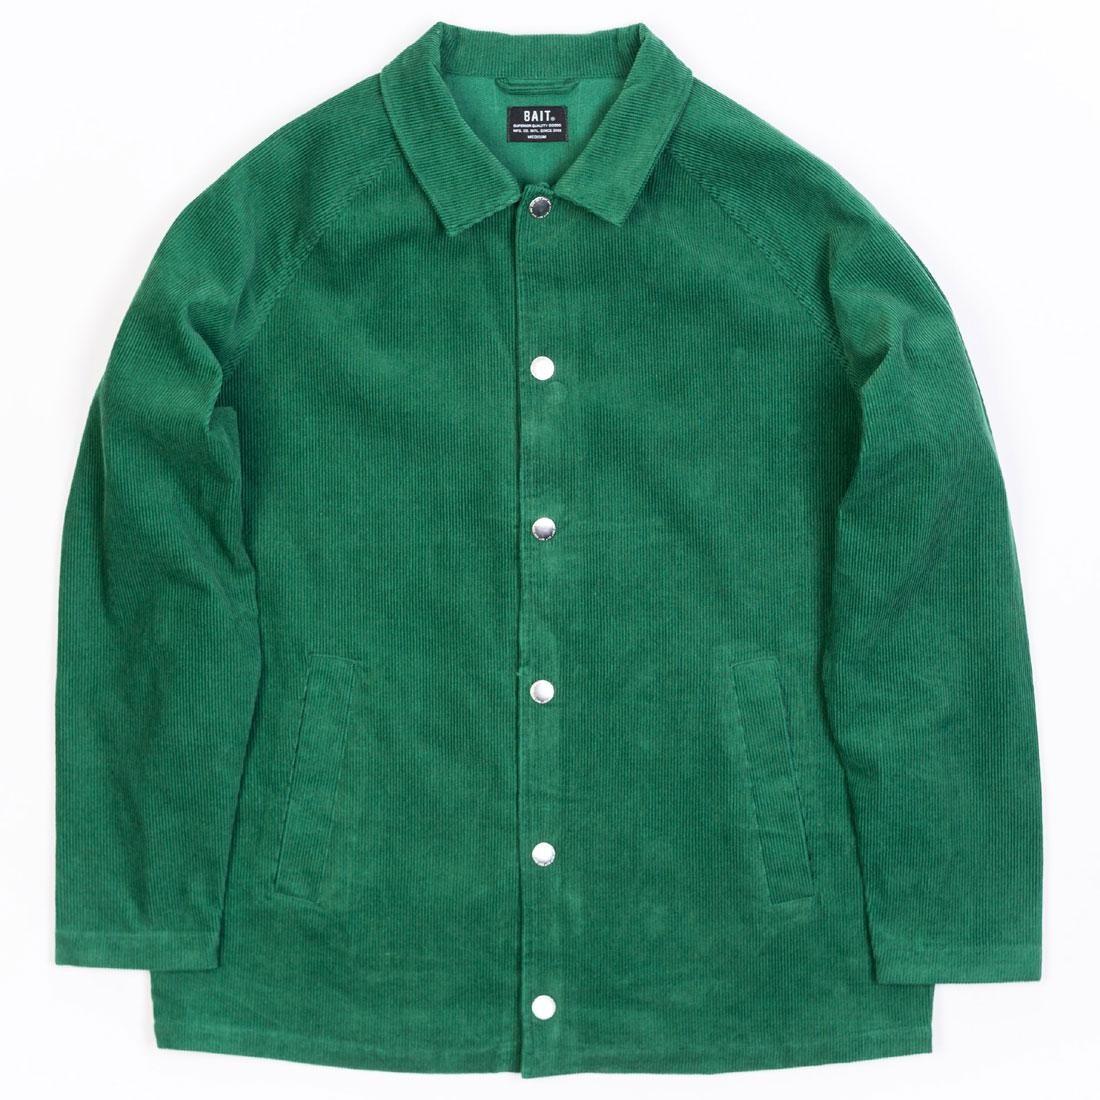 BAIT Unisex Corduroy Coaches Jacket (green / kelly)